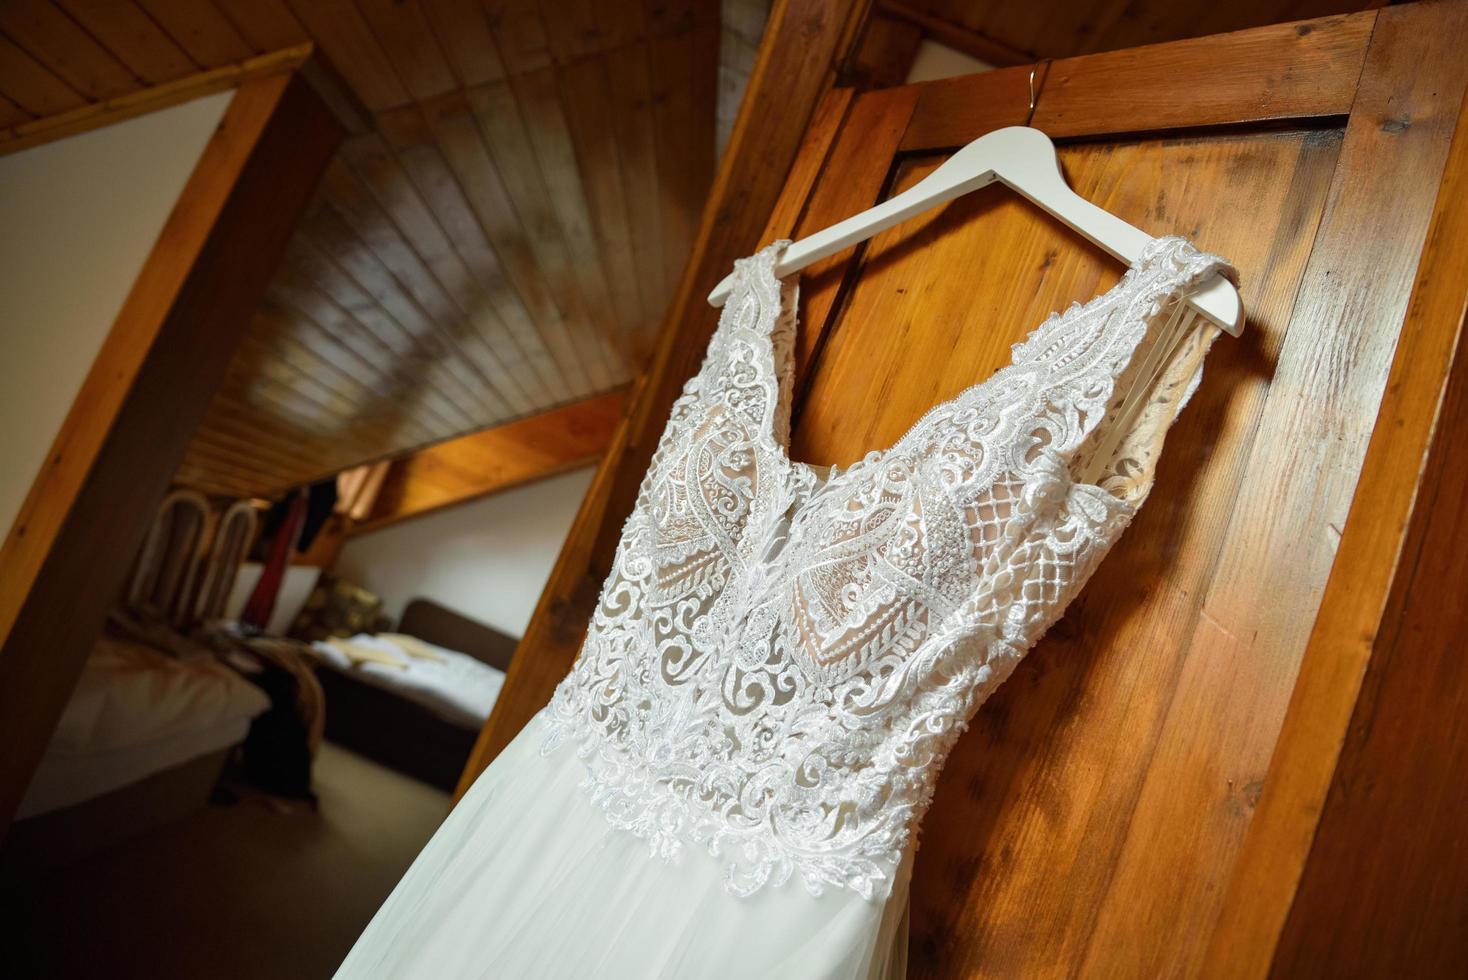 Dress bride on shoulders in closet photo